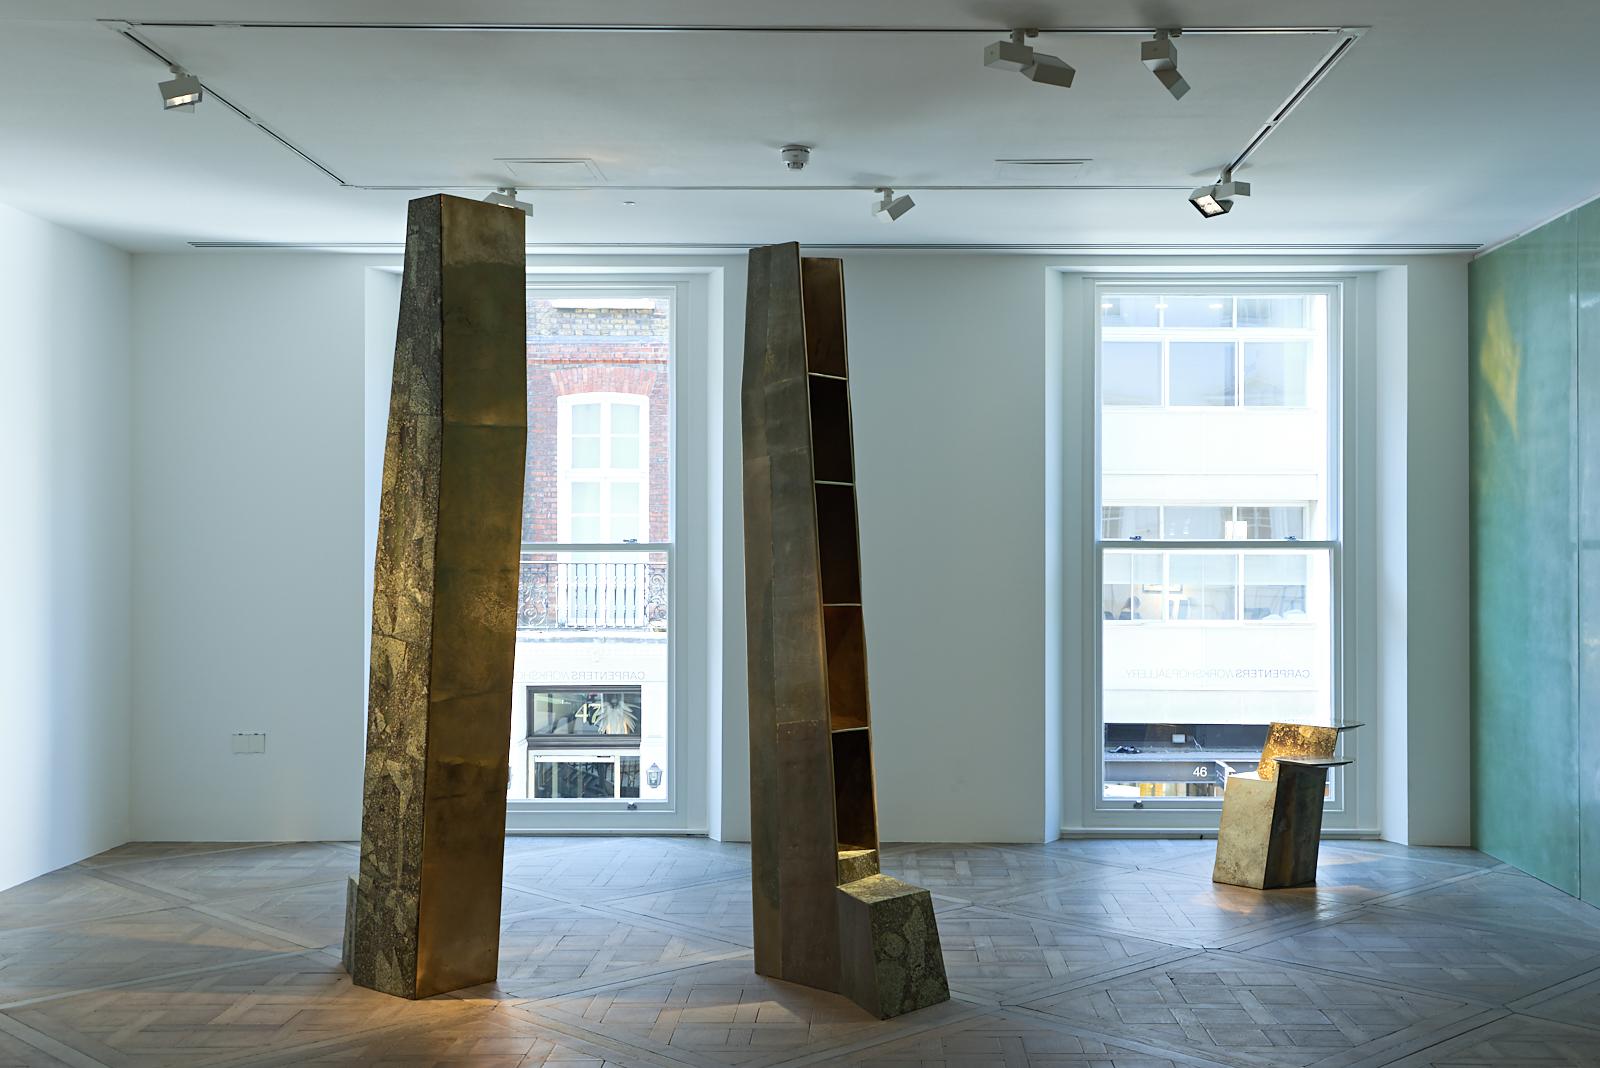 Vincenzo de Cotiis | En Plein Air | Carpenters Workshop Gallery